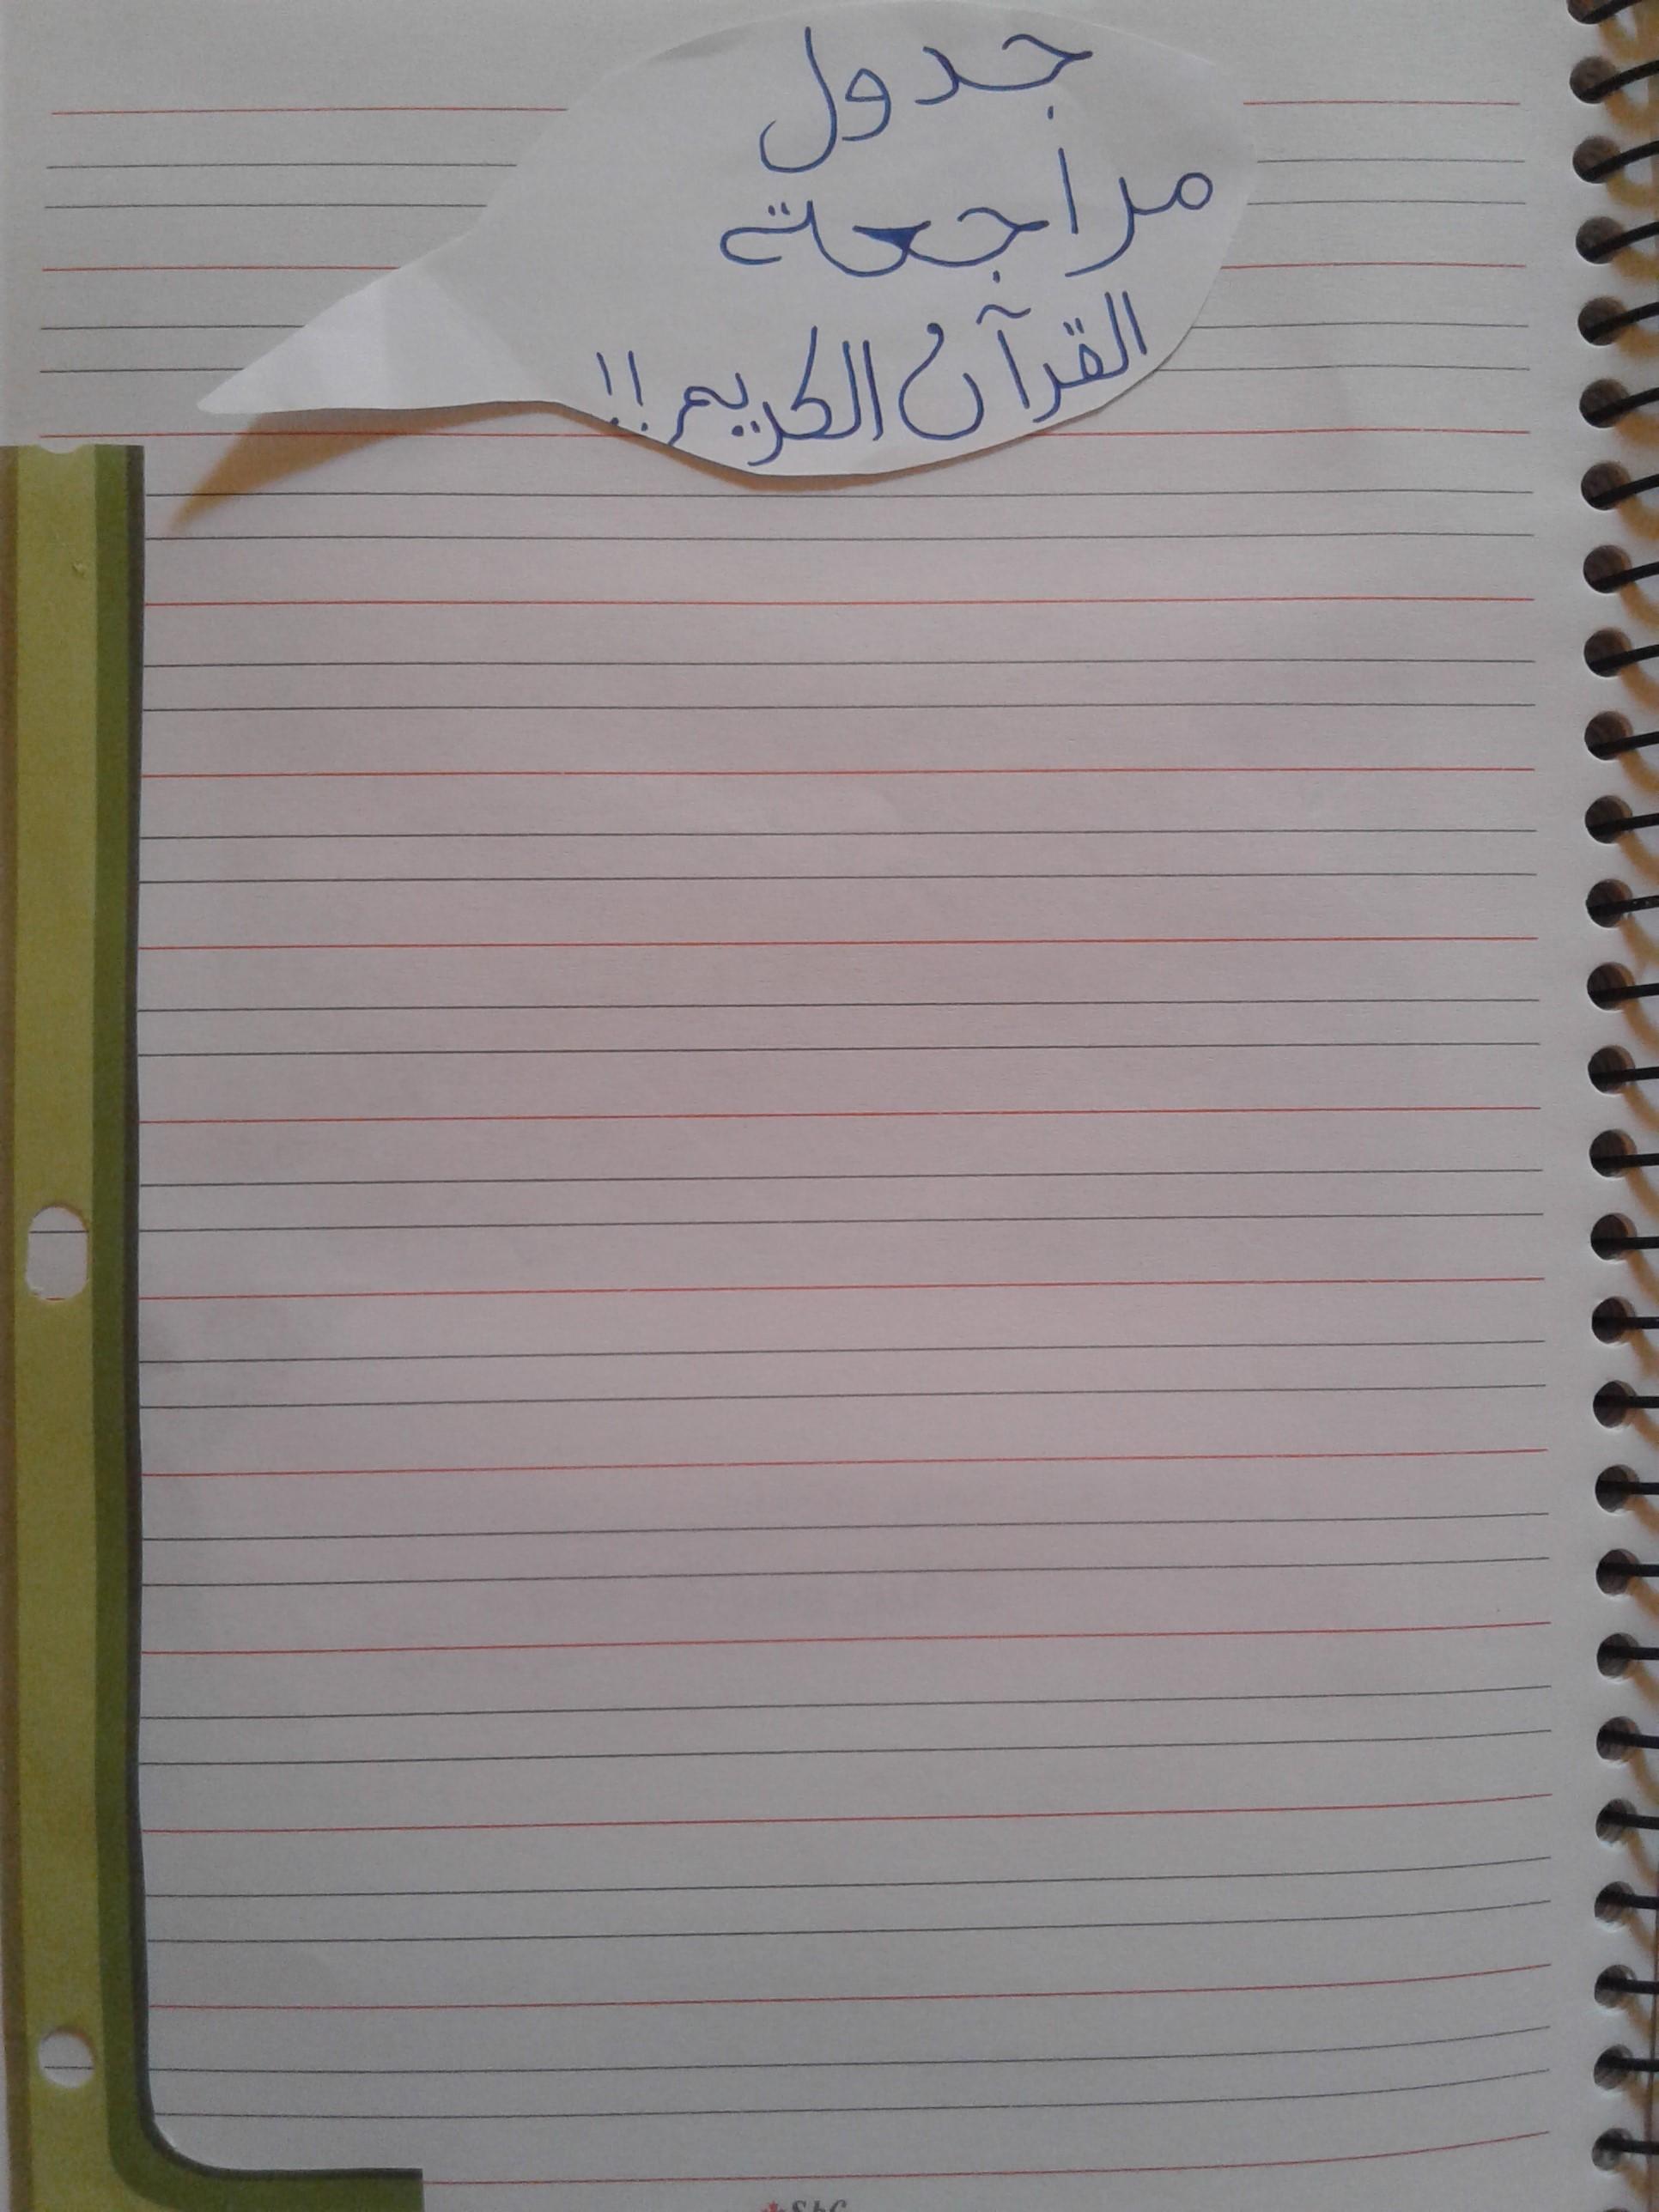 akhawat_islamway_1504360352___.jpg